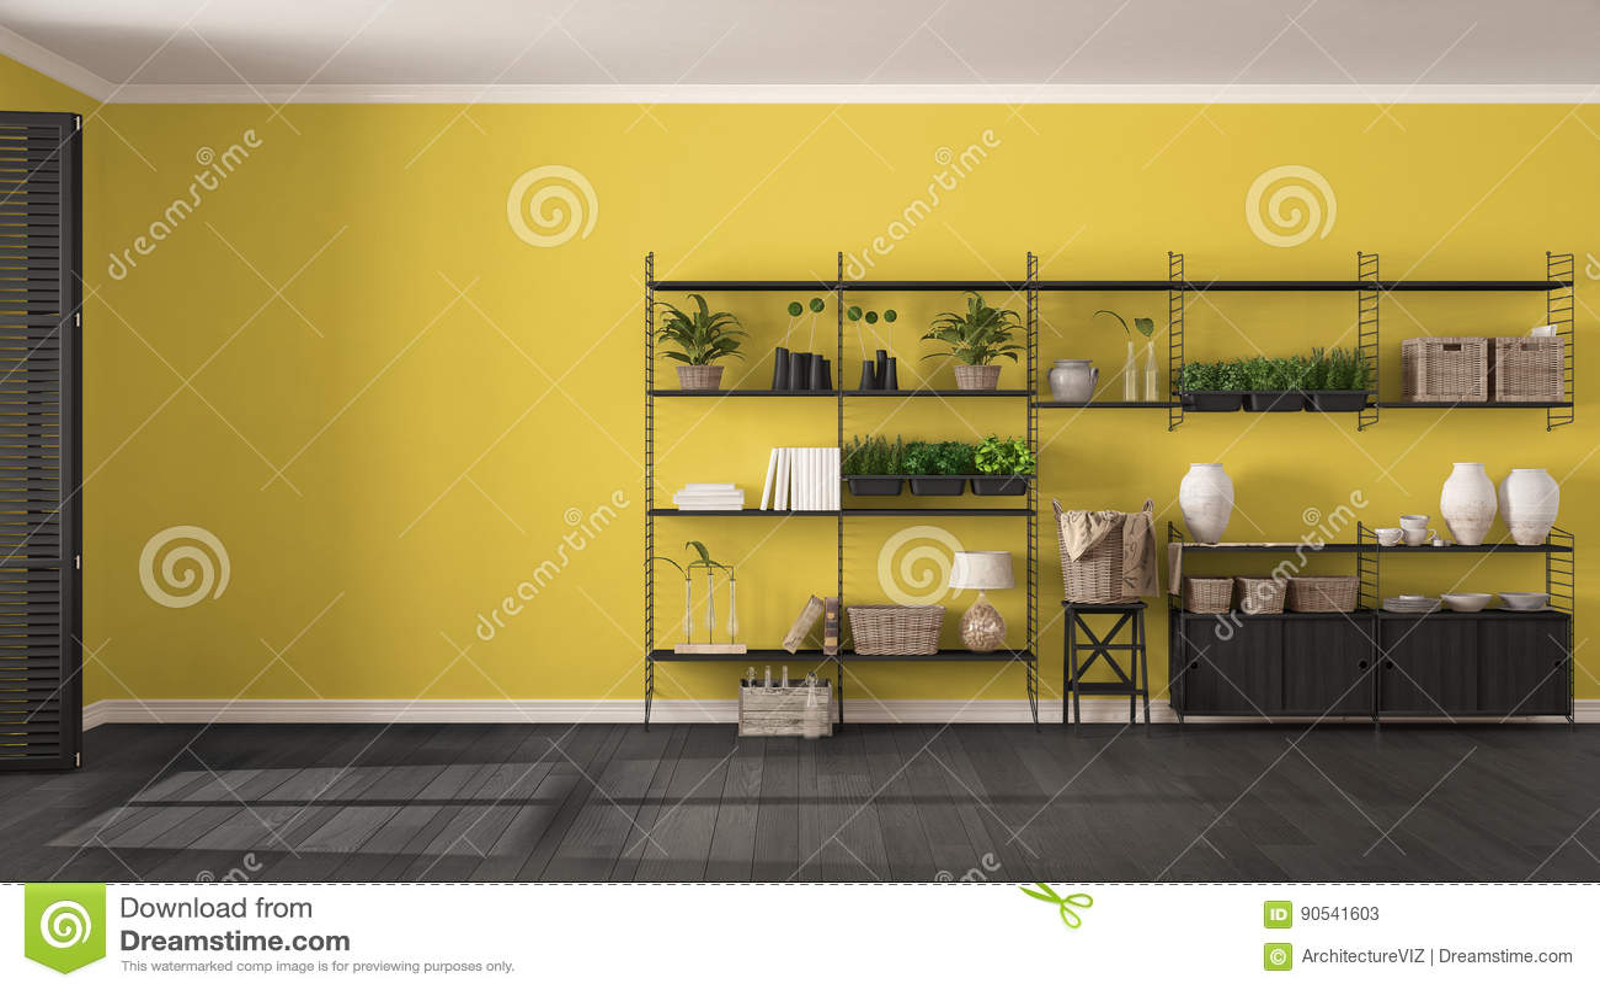 Eco Gray And Yellow Interior Design With Wooden Bookshelf, Diy V ...